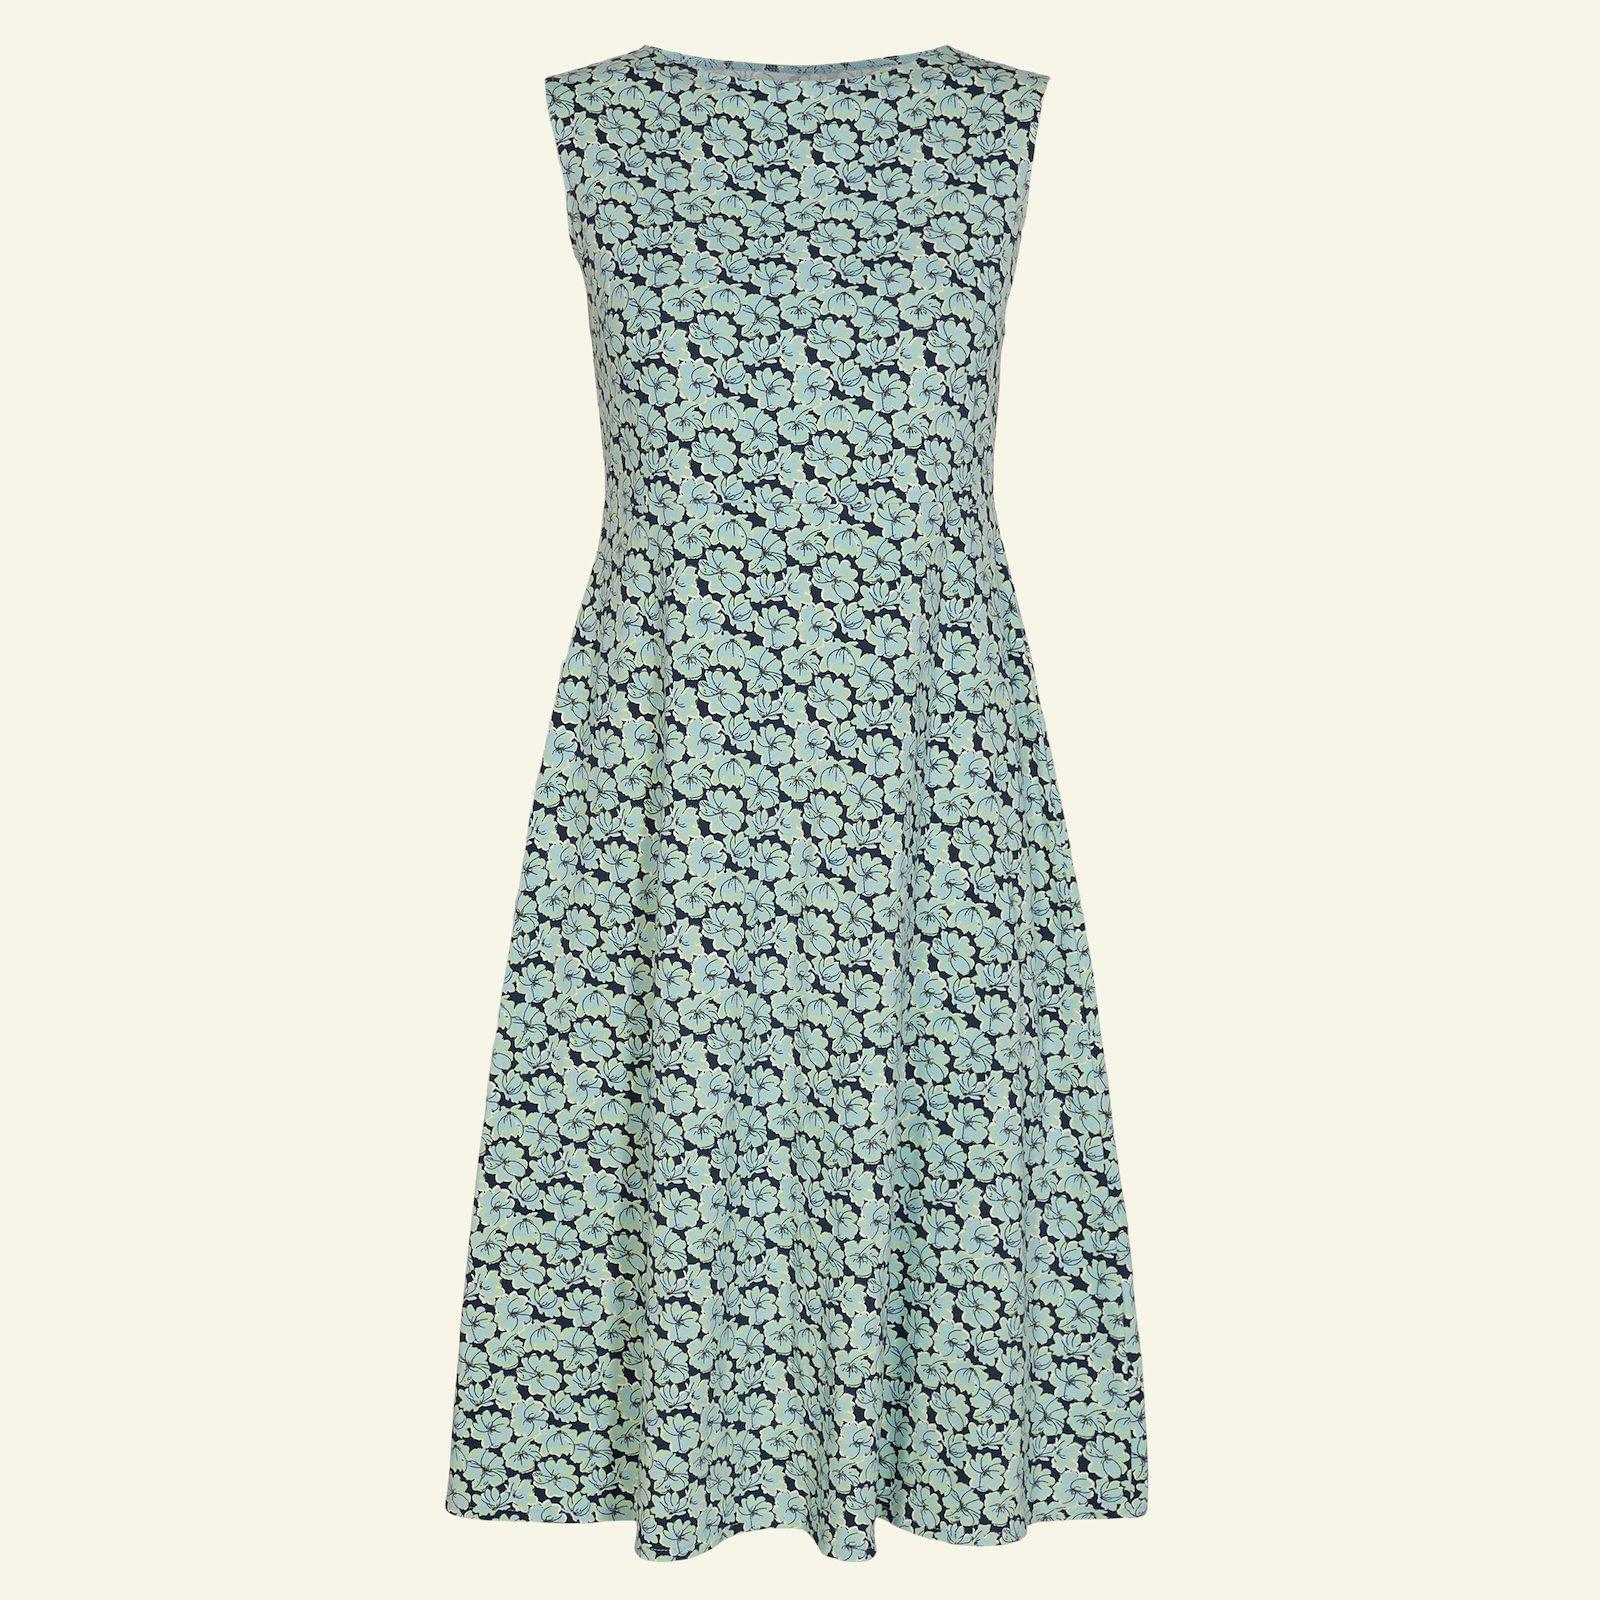 Dress with a full skirt, 46/18 p23154_272698_sskit